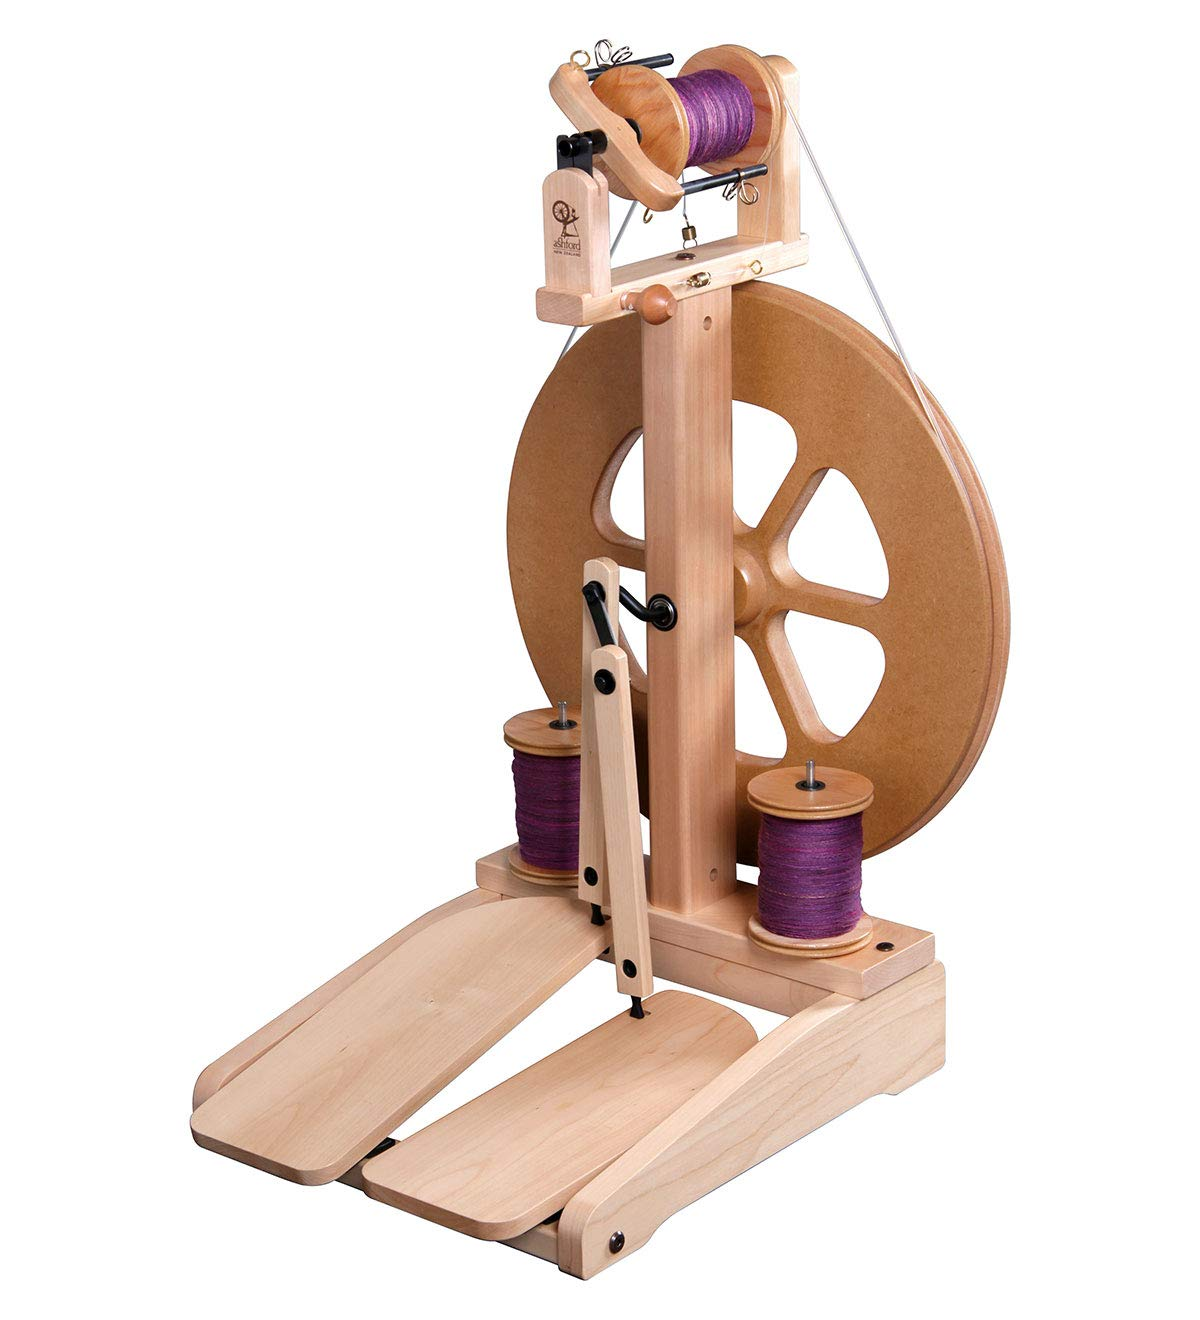 Ashford Kiwi Spinning Wheel, Double Treadle, Natural